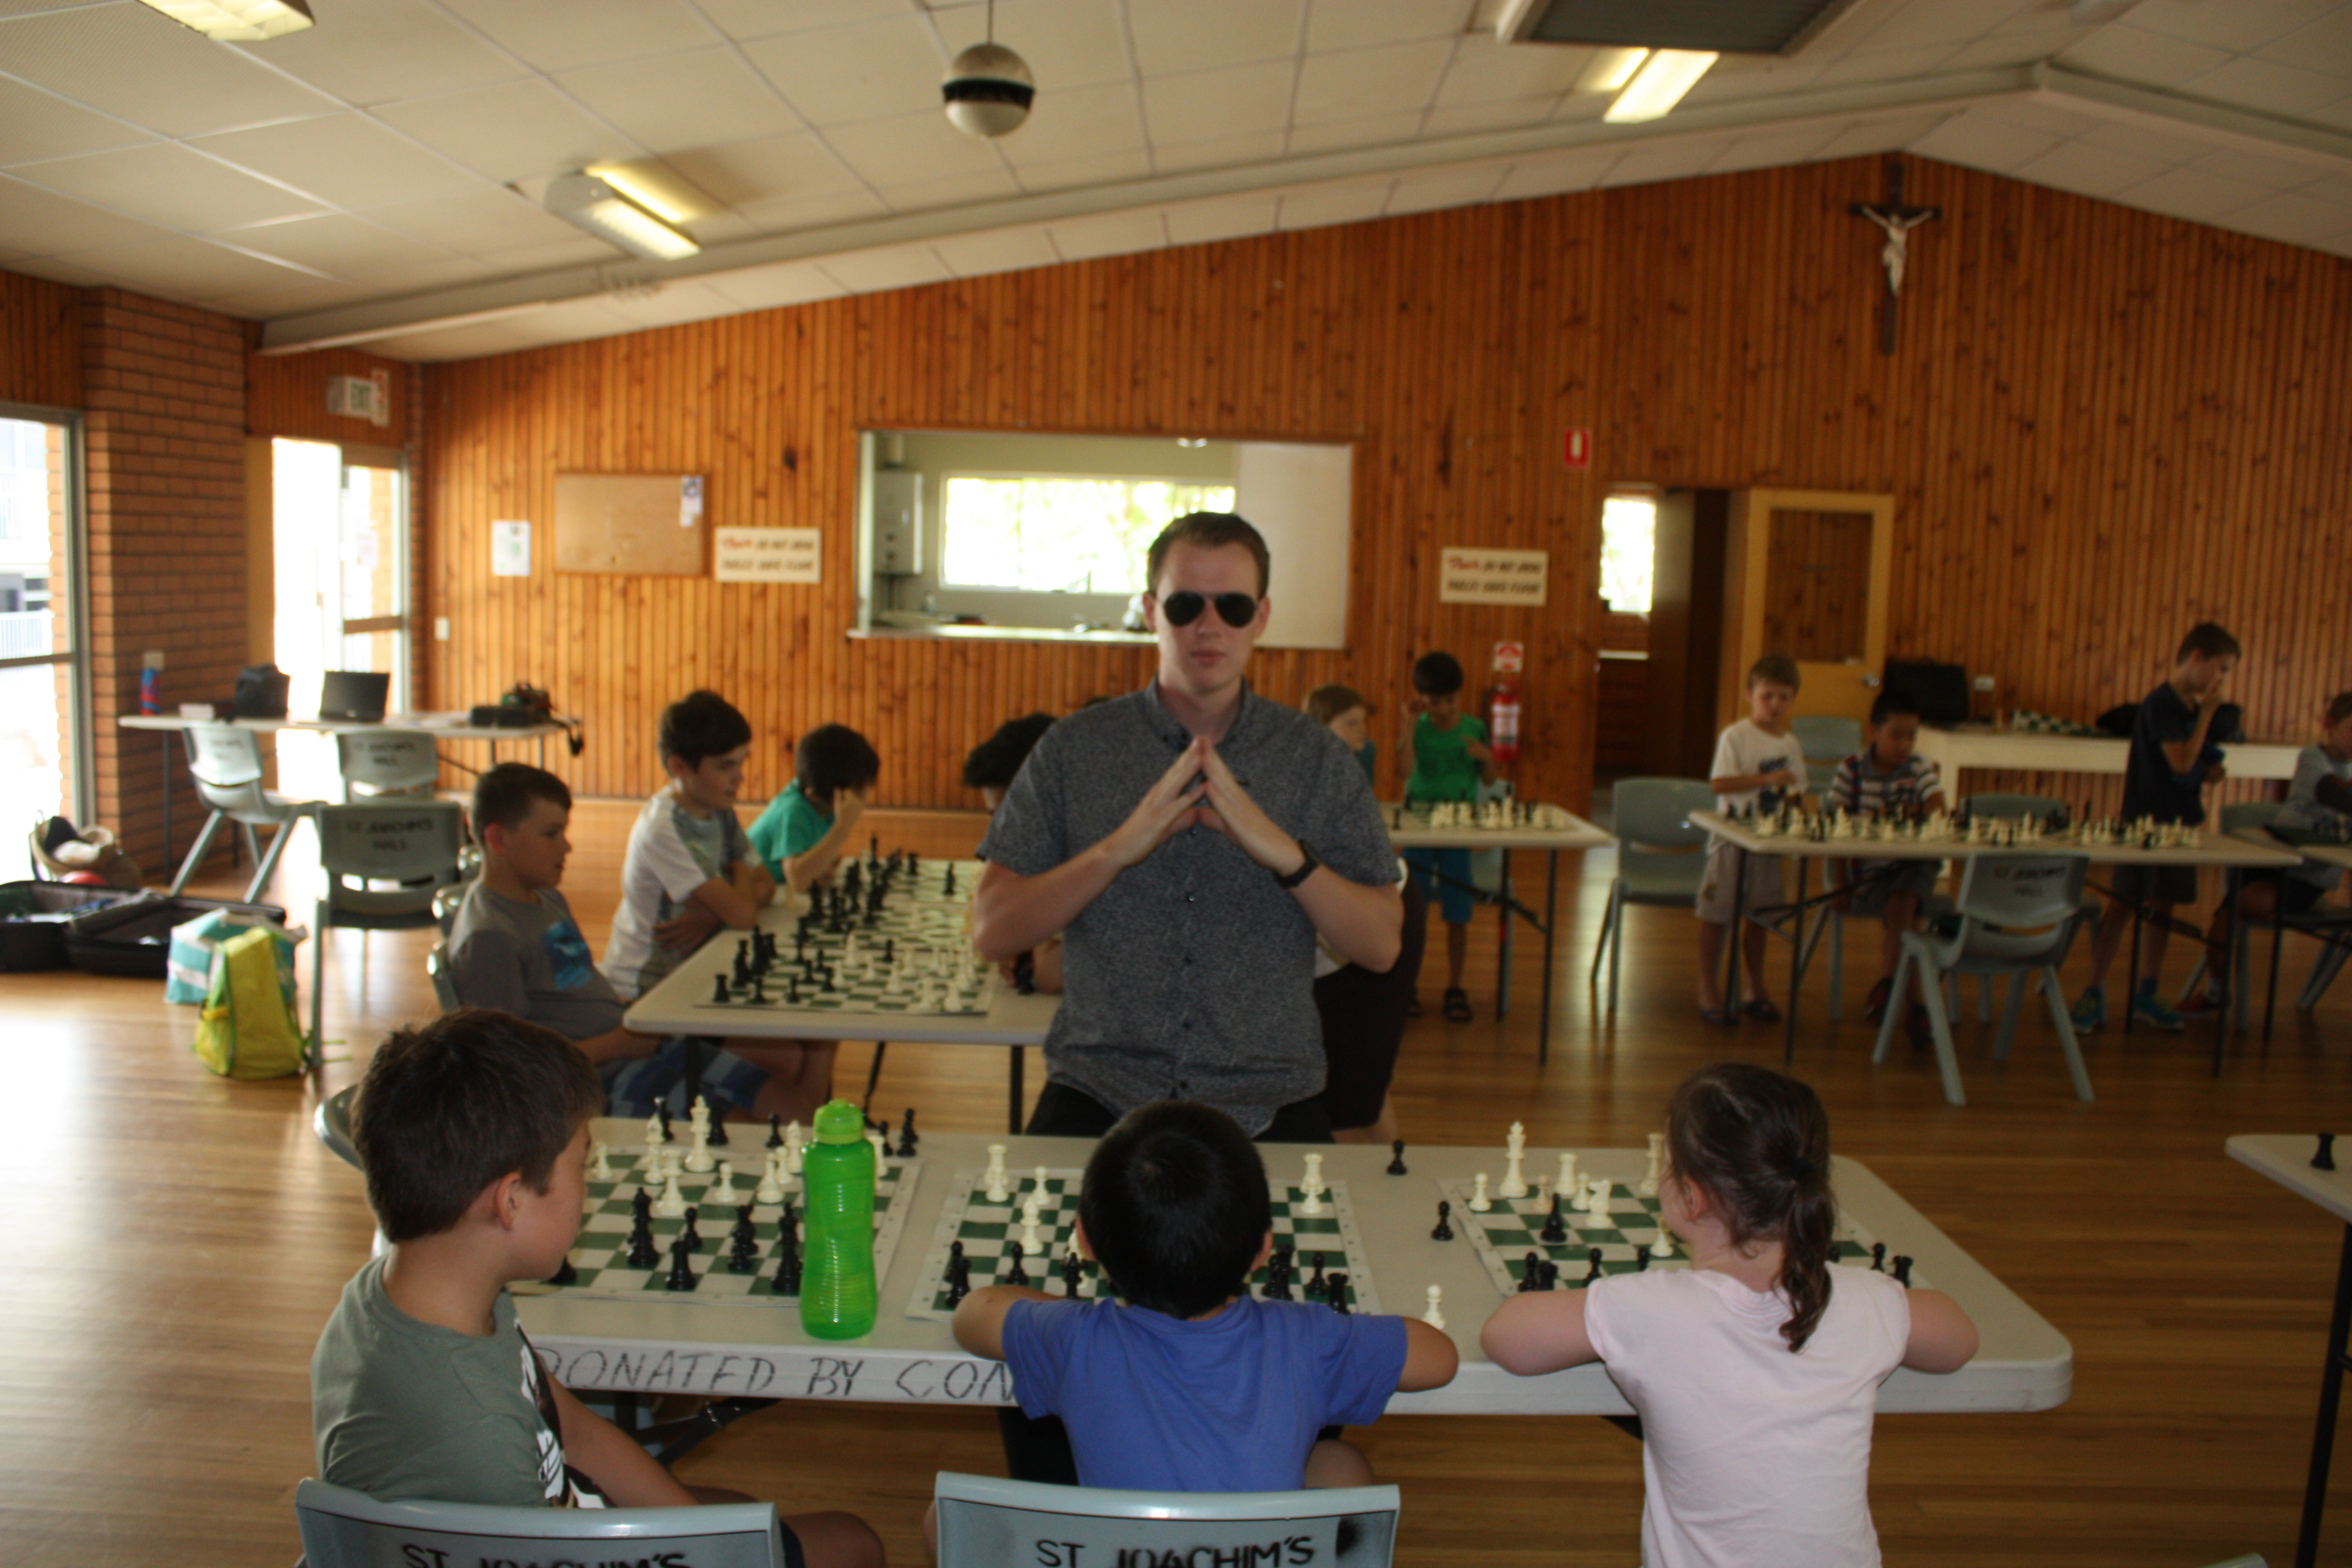 Matrix or Chess?